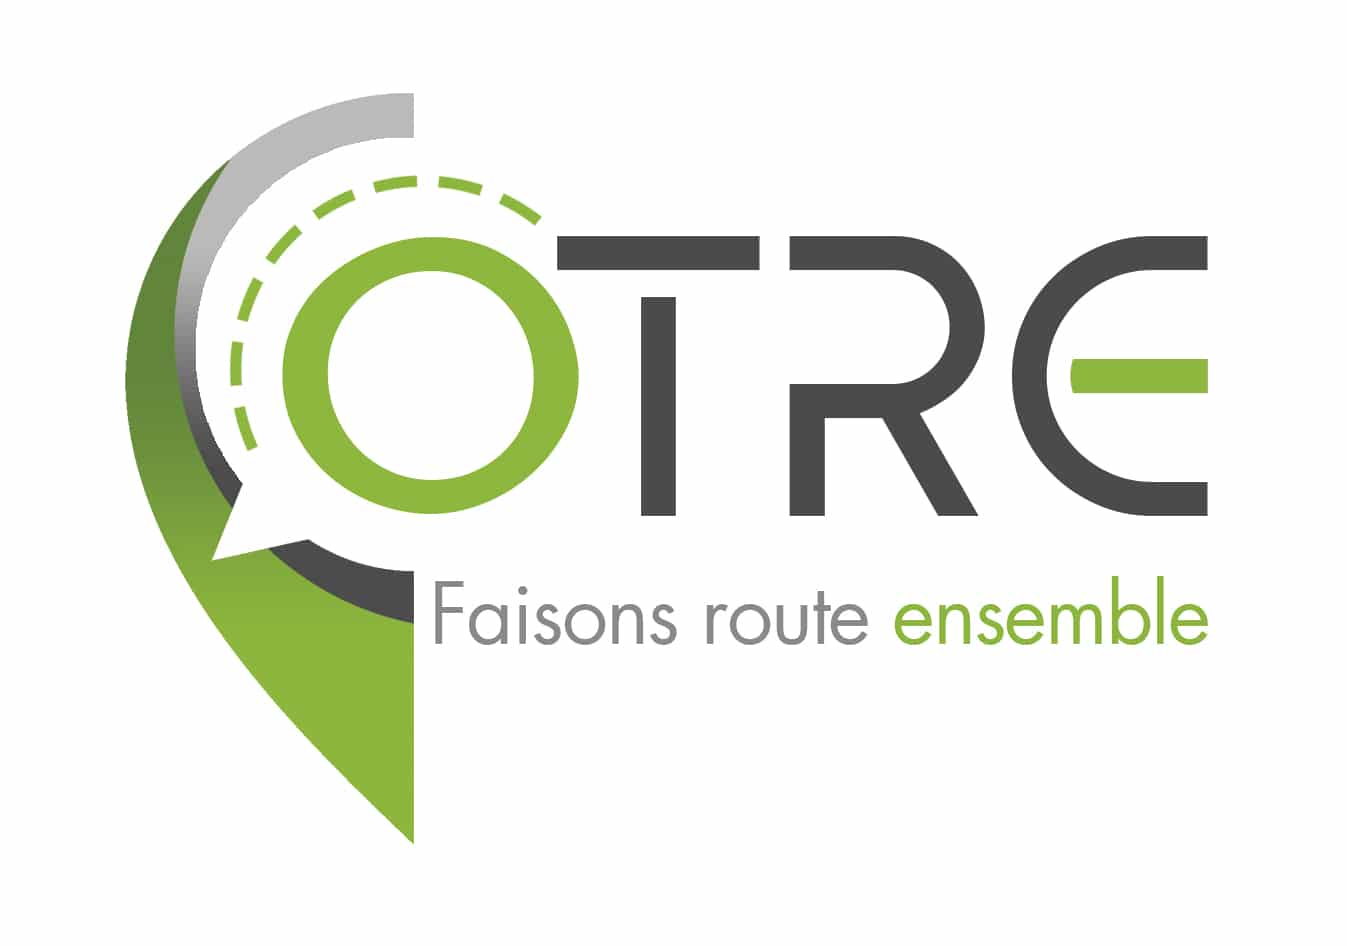 Logo Otre